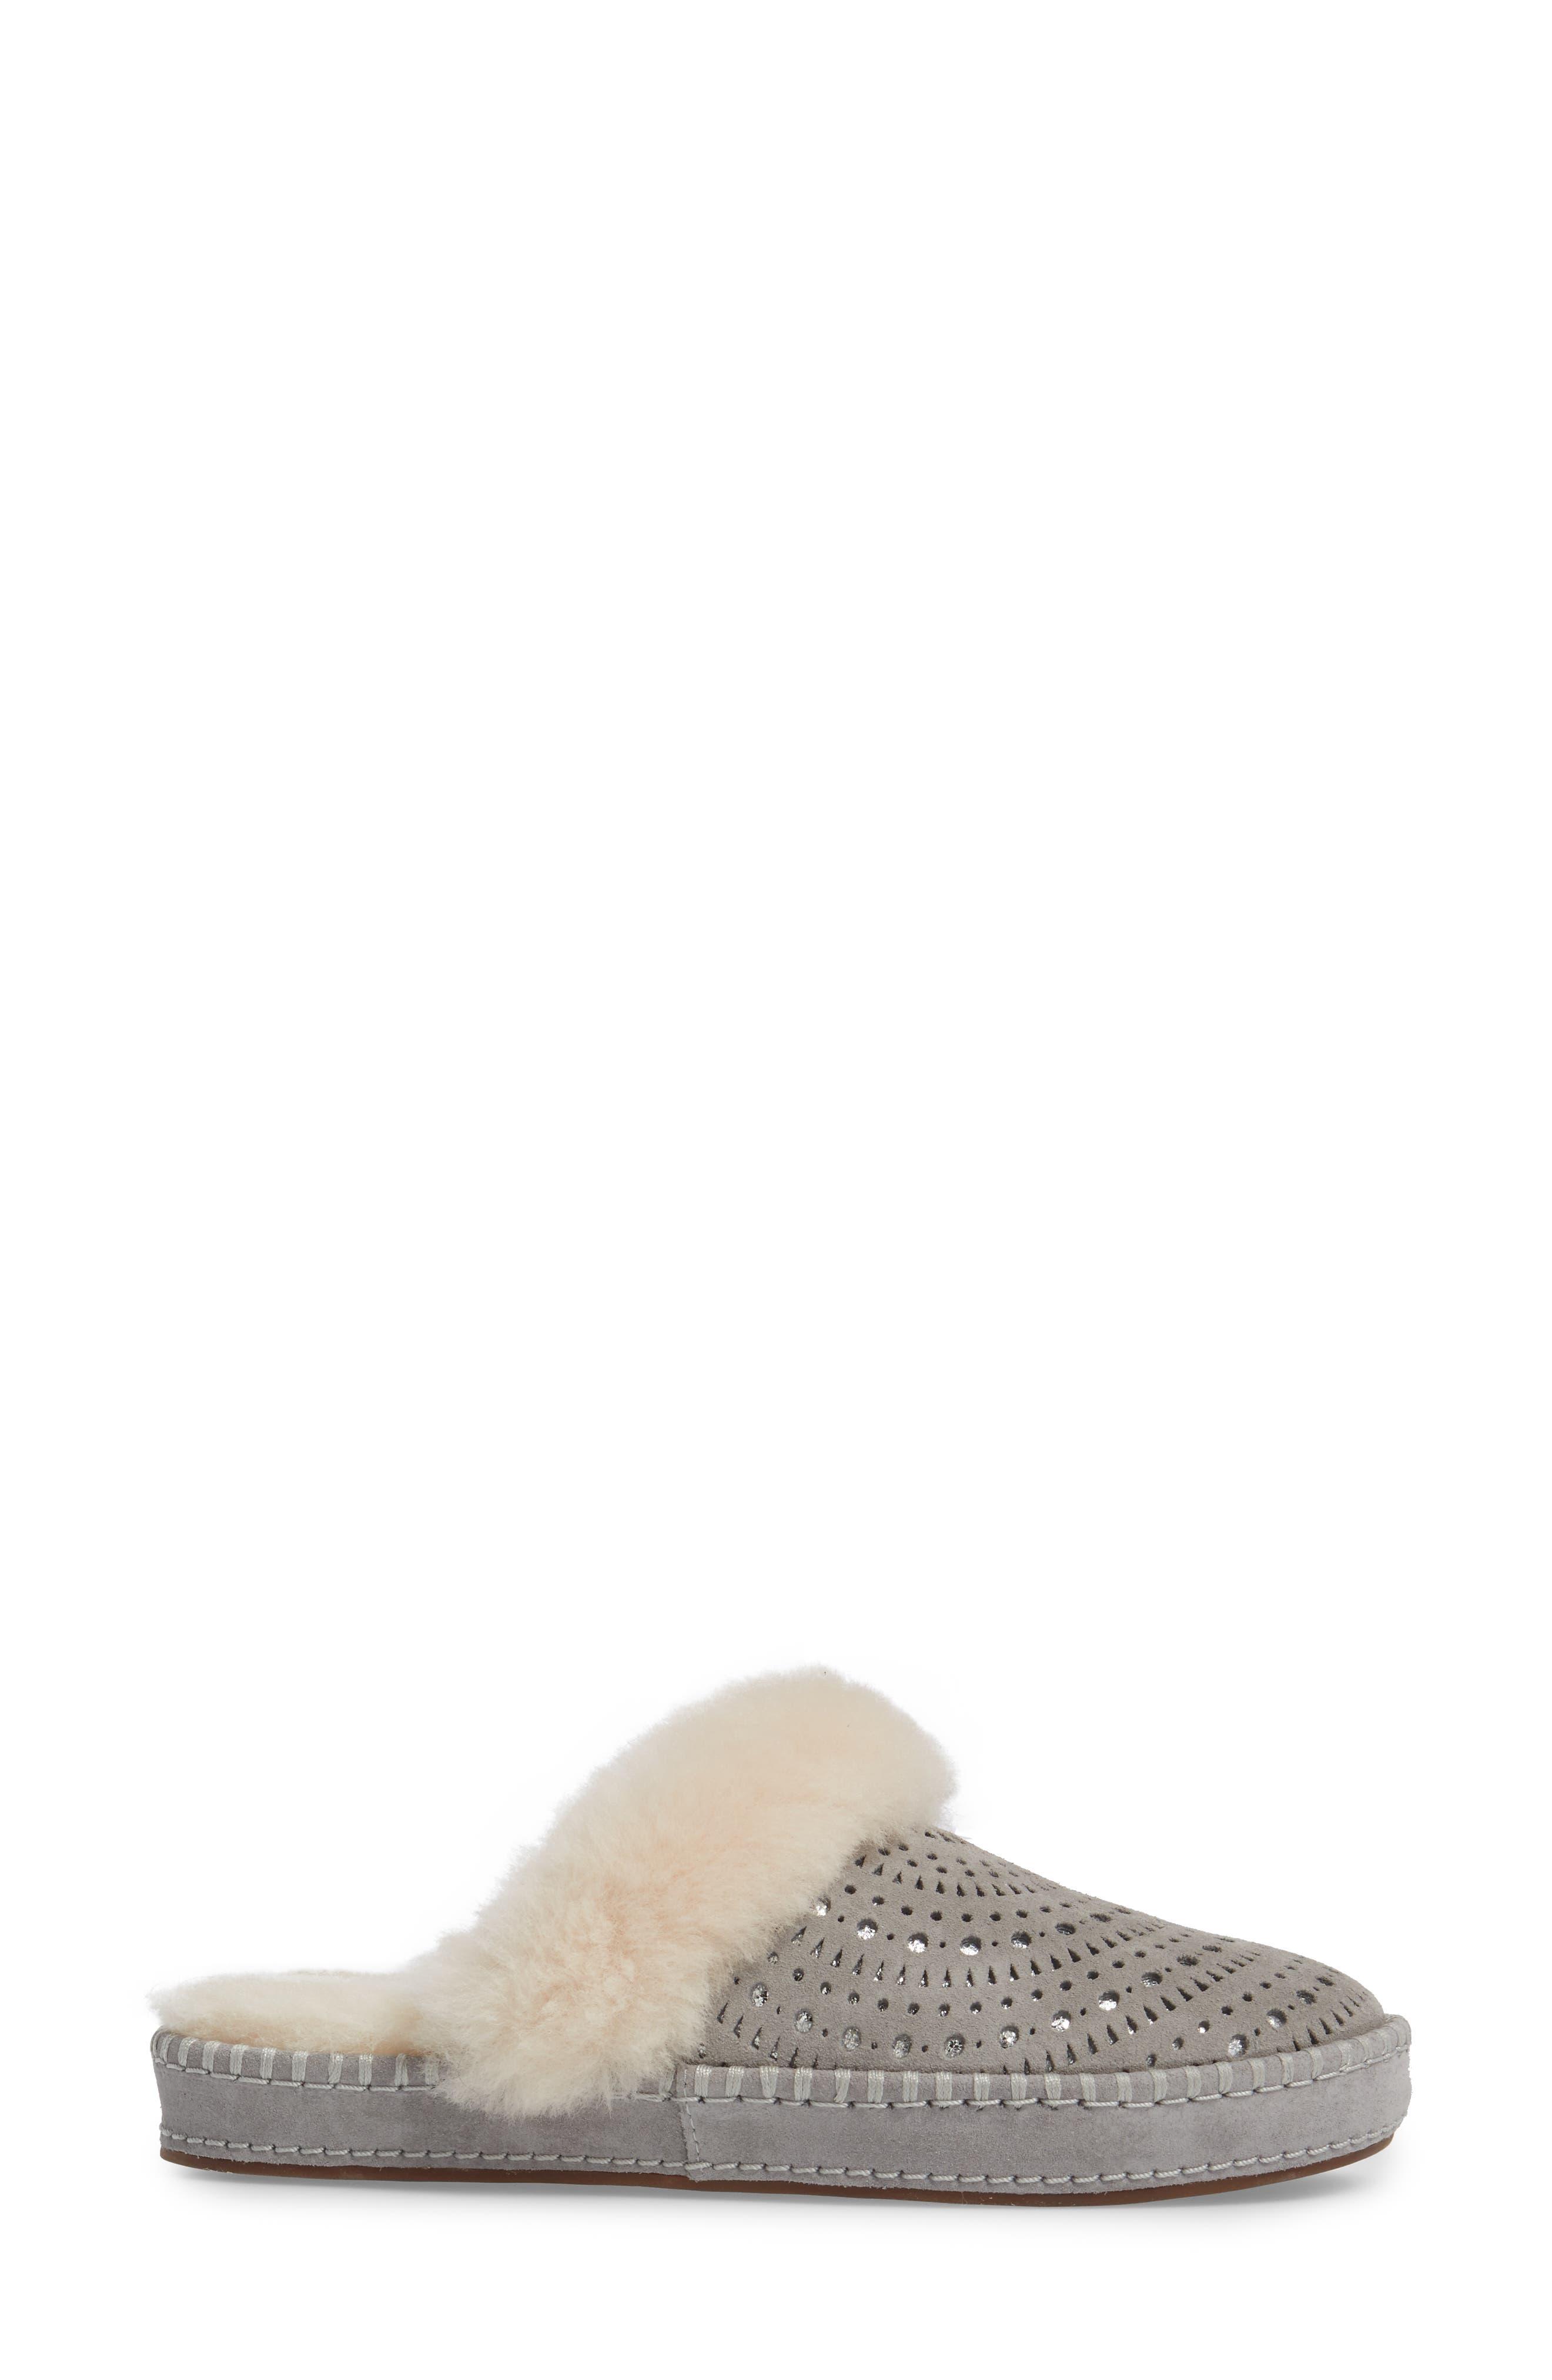 Aira Sunshine Genuine Shearling Slipper,                             Alternate thumbnail 3, color,                             024